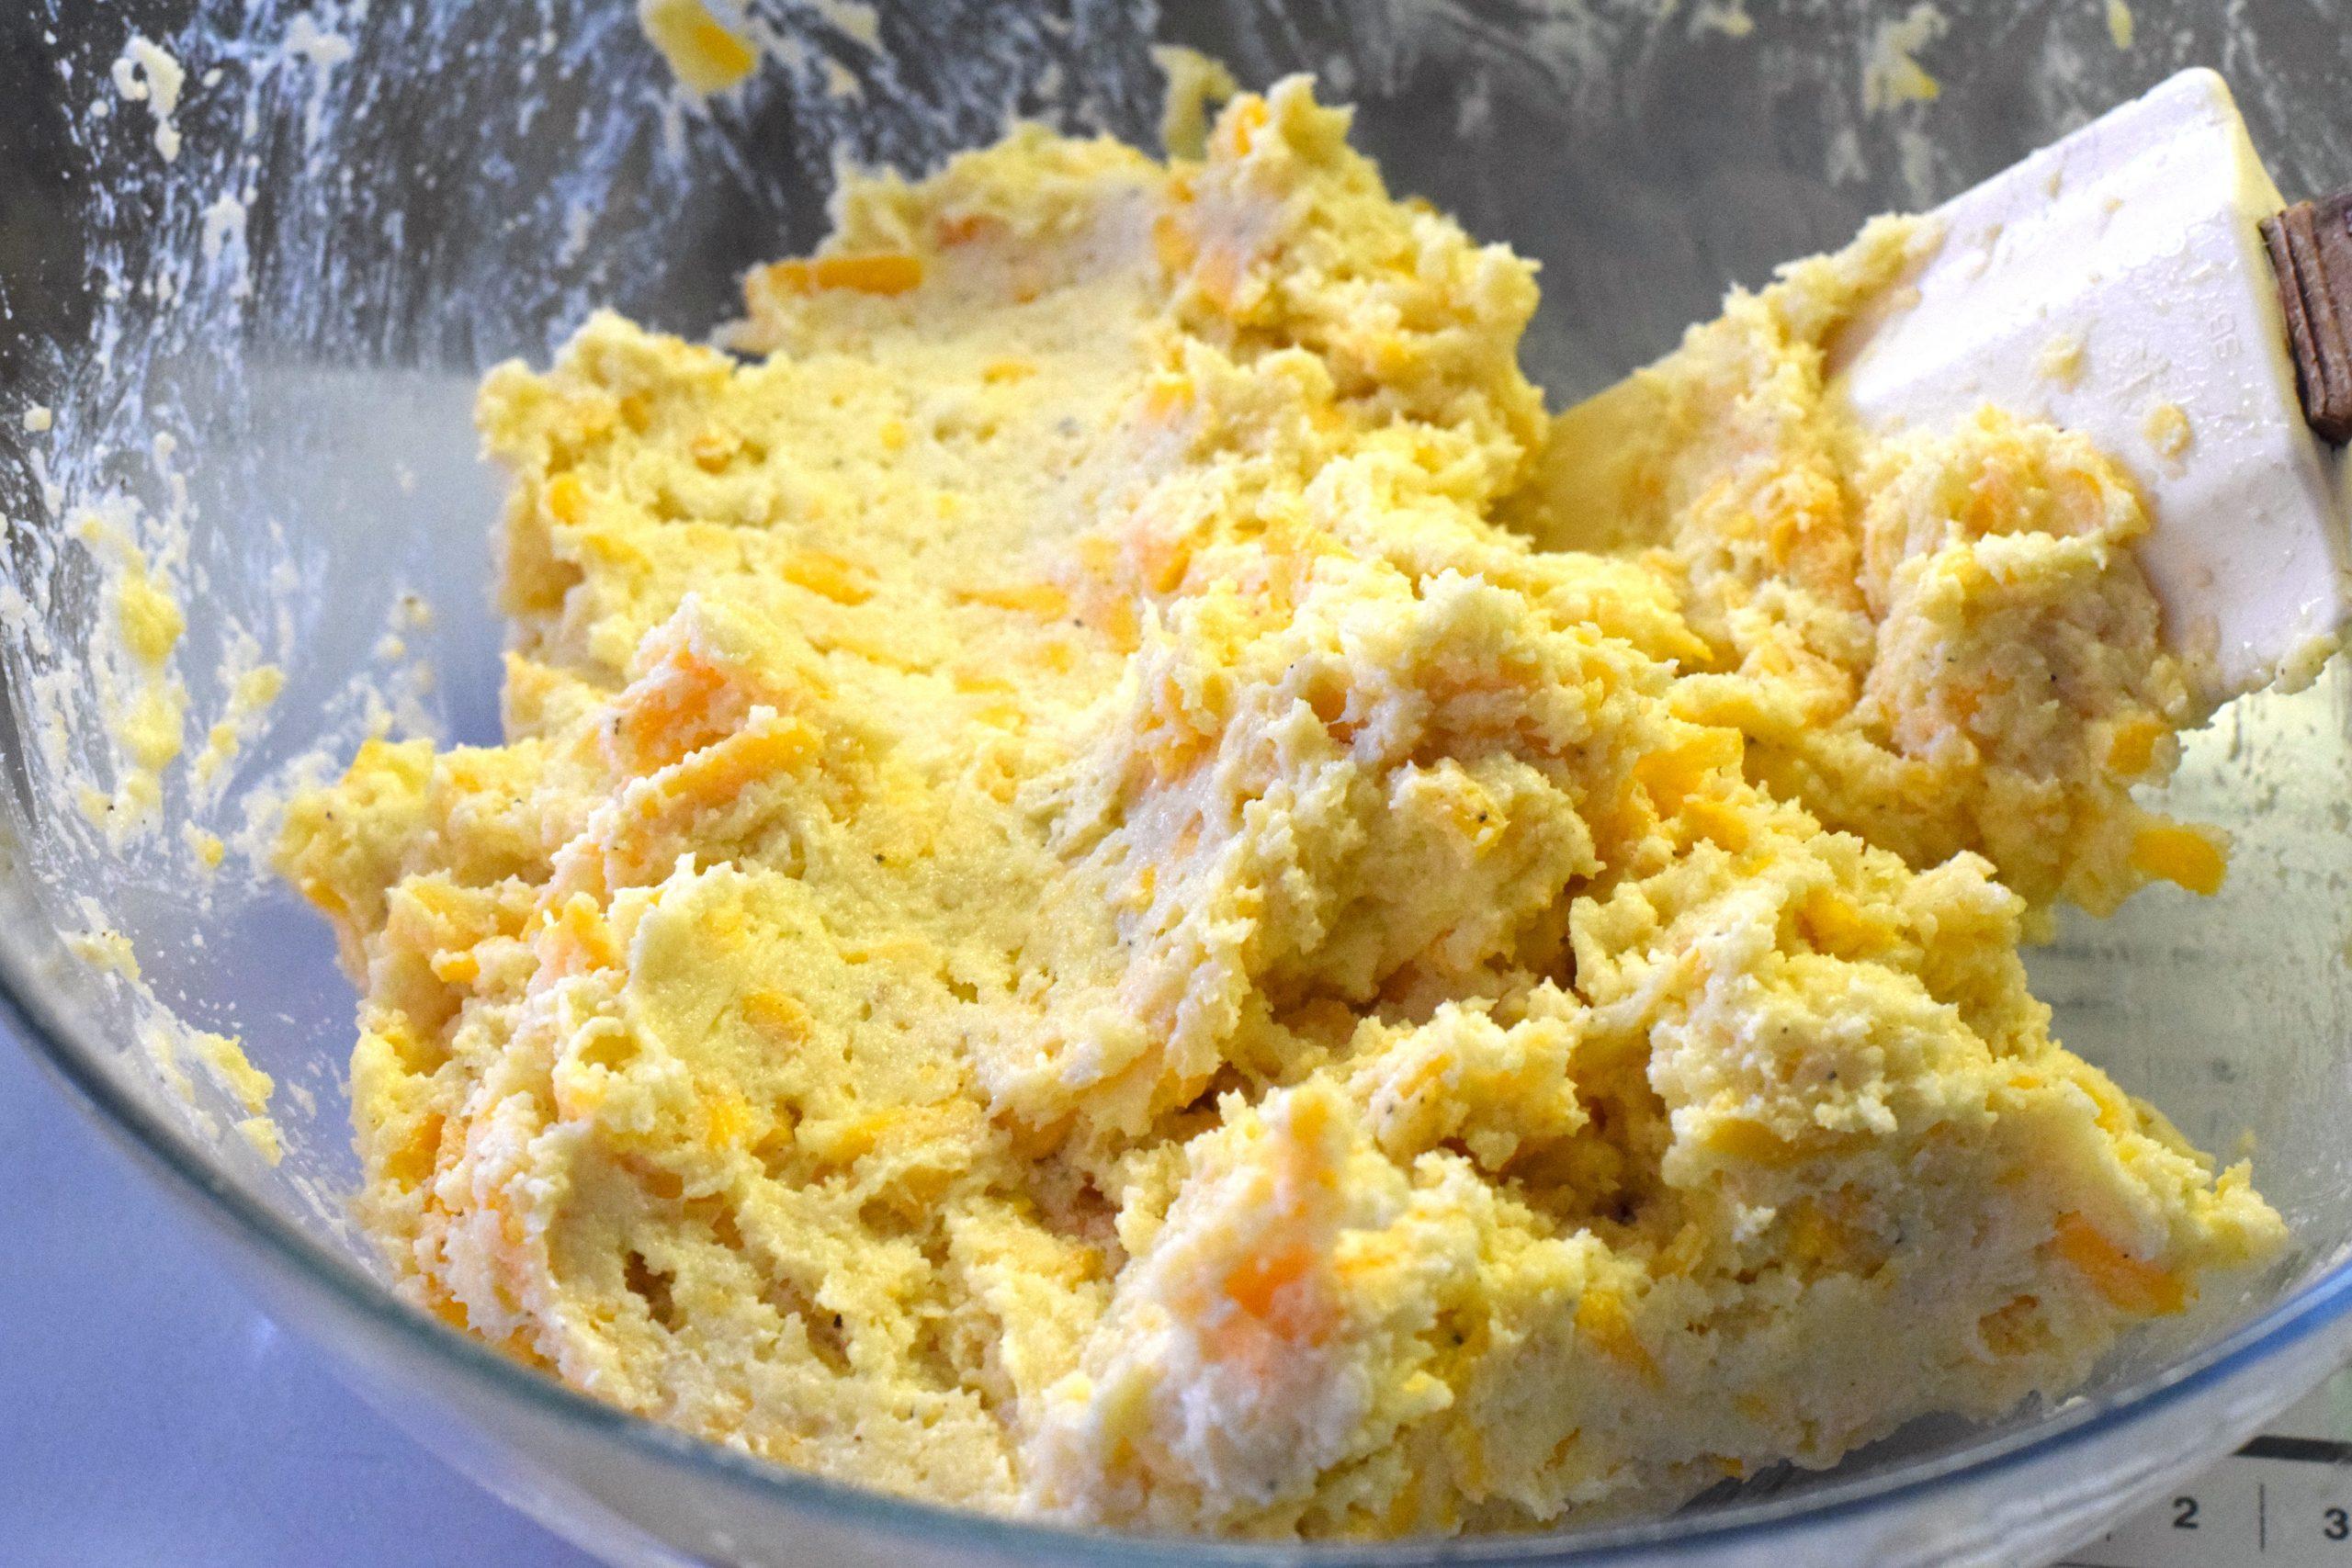 eggs, butter, cheese, almond flour, coconut flour